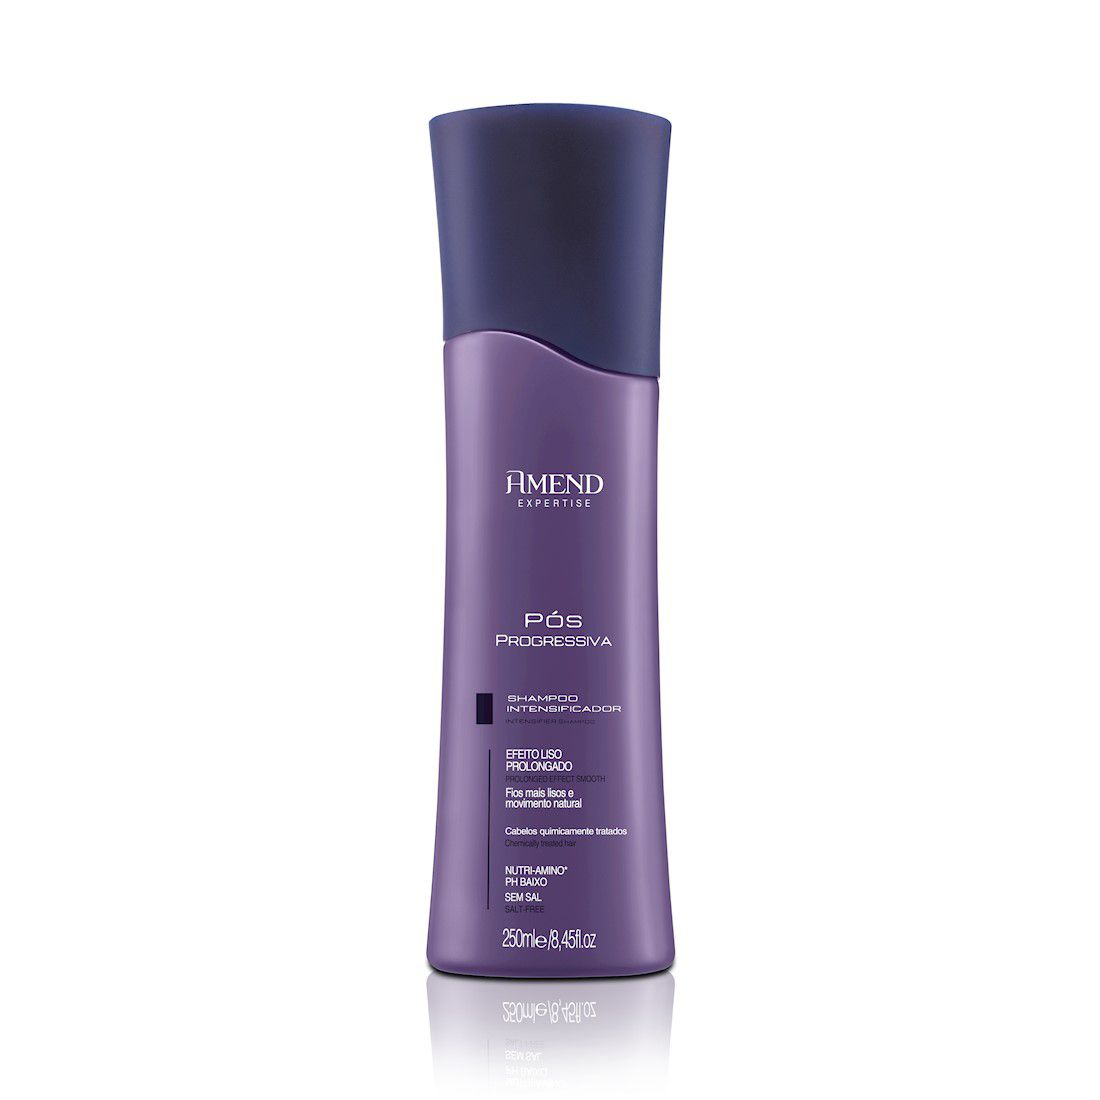 Amend Shampoo Expertise Pós-progressiva 250mL